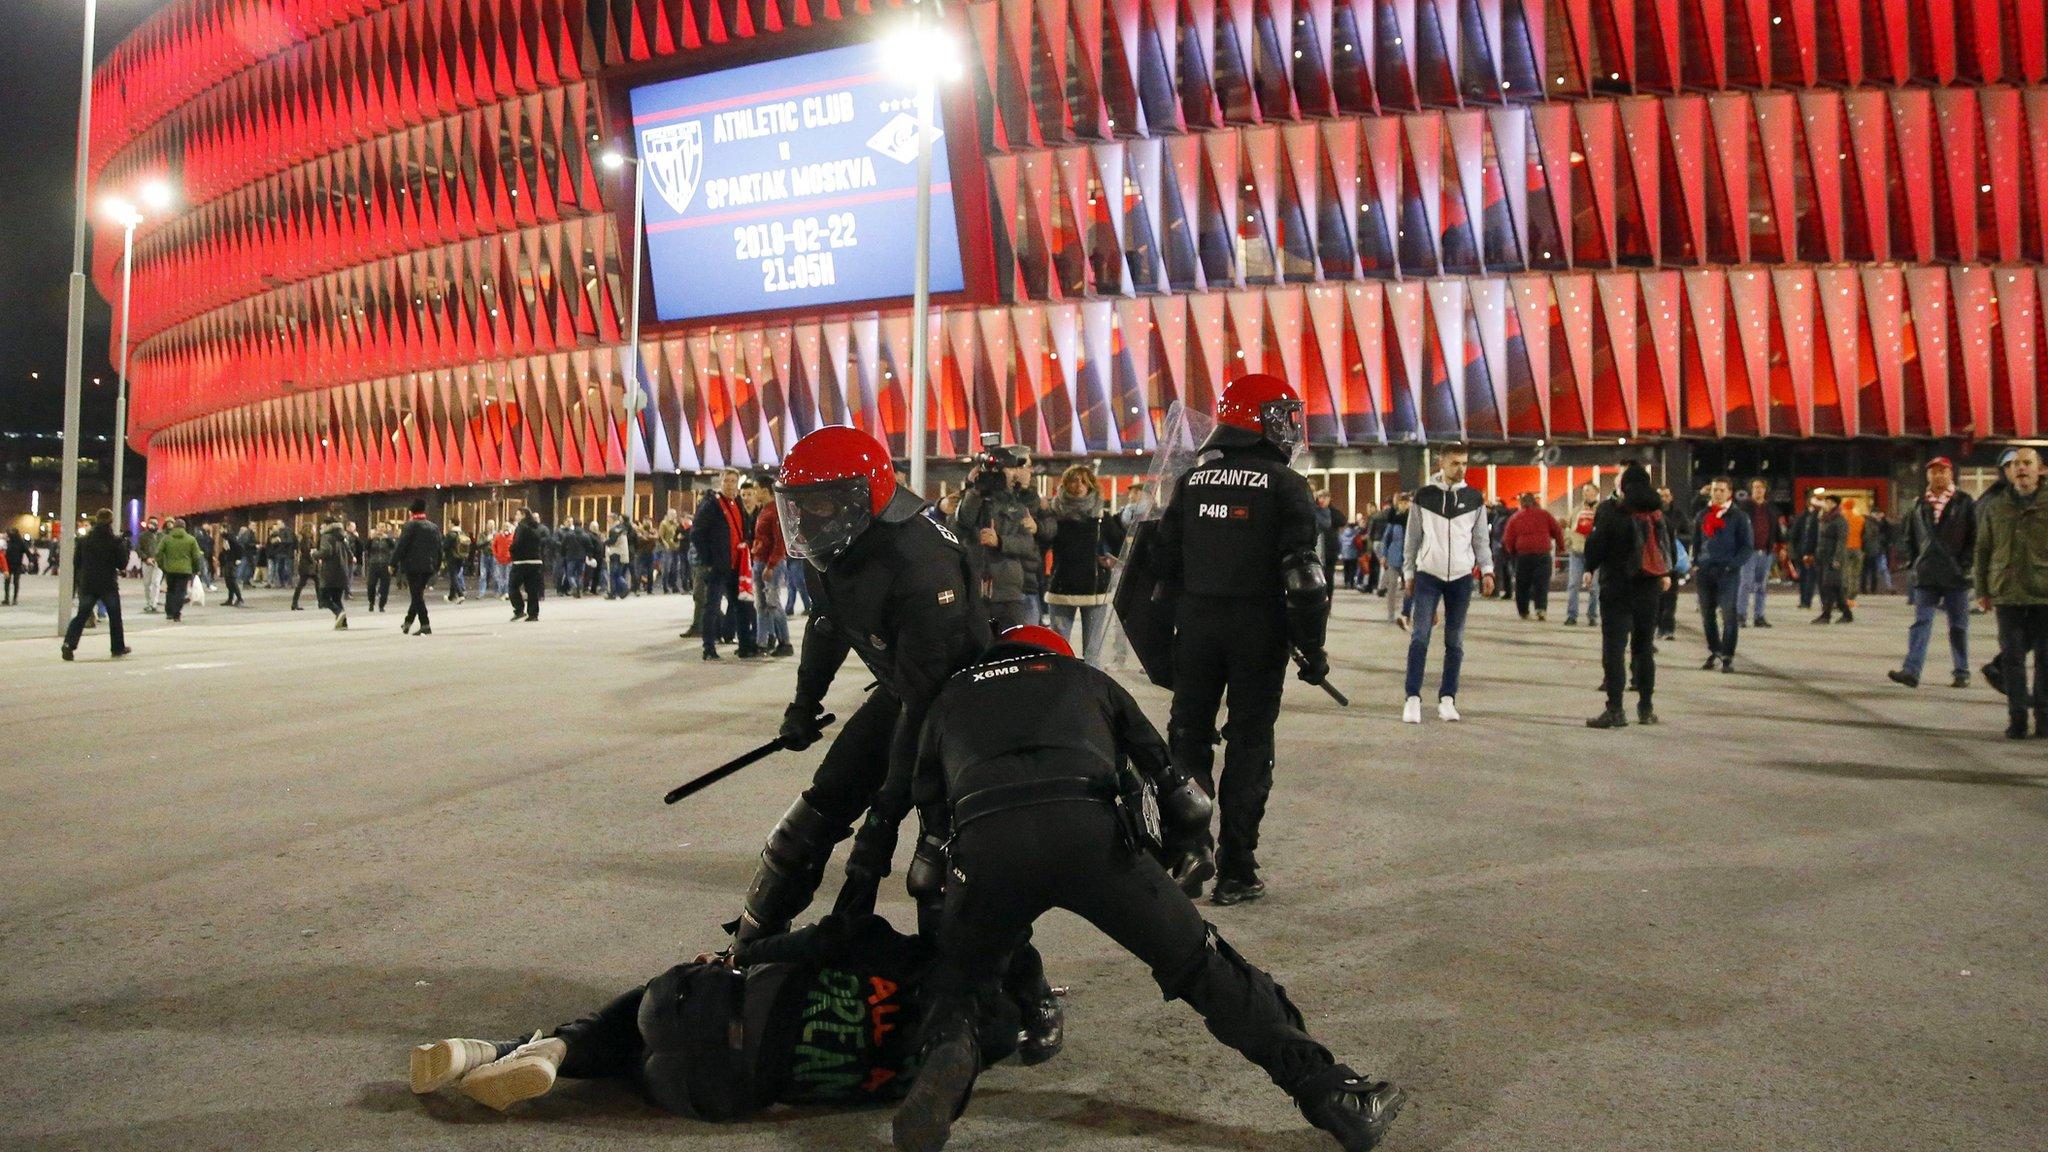 Police officer dies in Bilbao v Spartak clashes